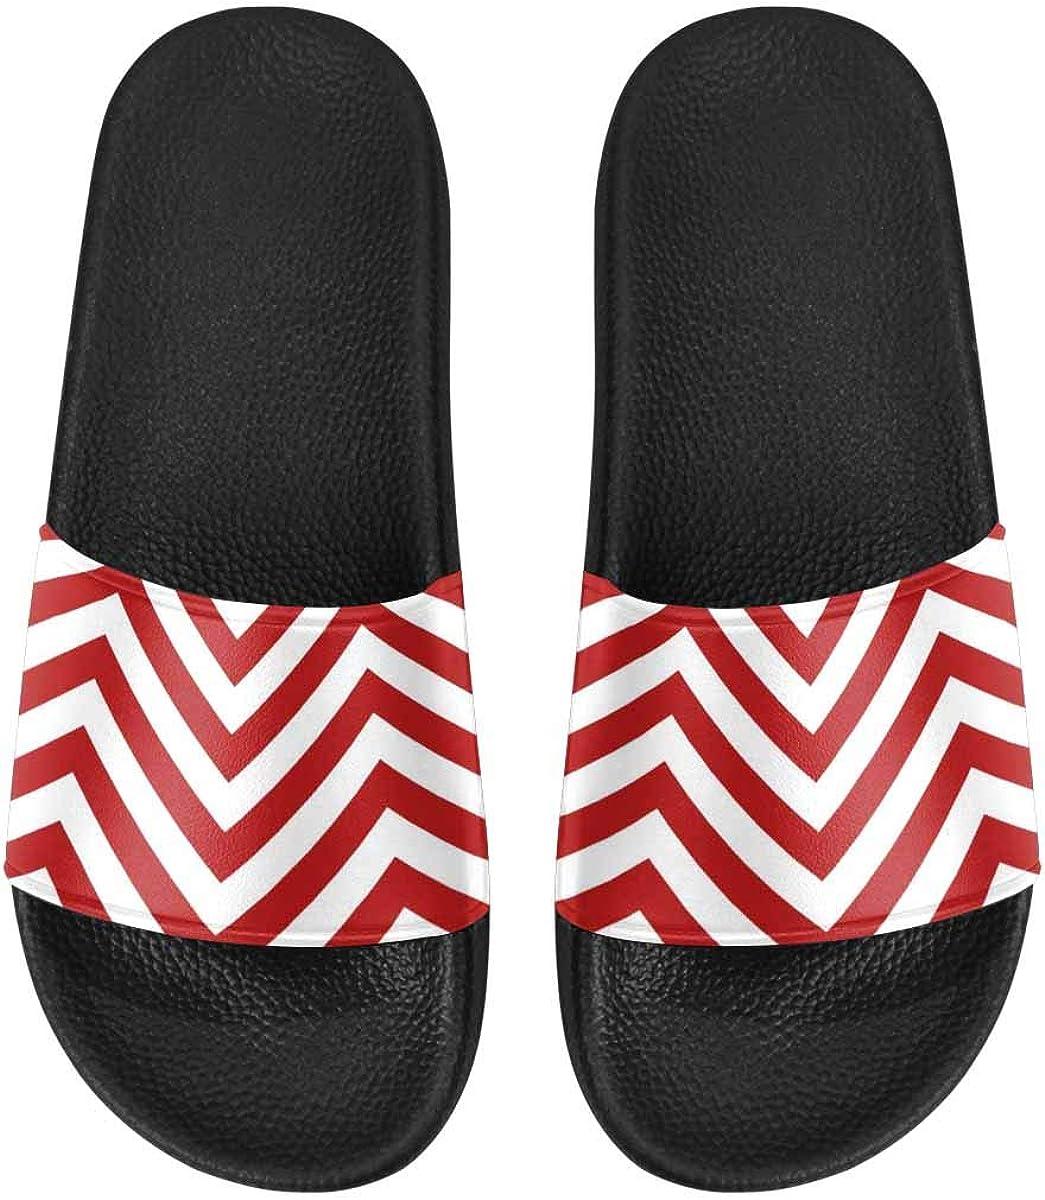 InterestPrint Women's Lightweight Slipper Sandals for Shower Chevrons Pattern Background